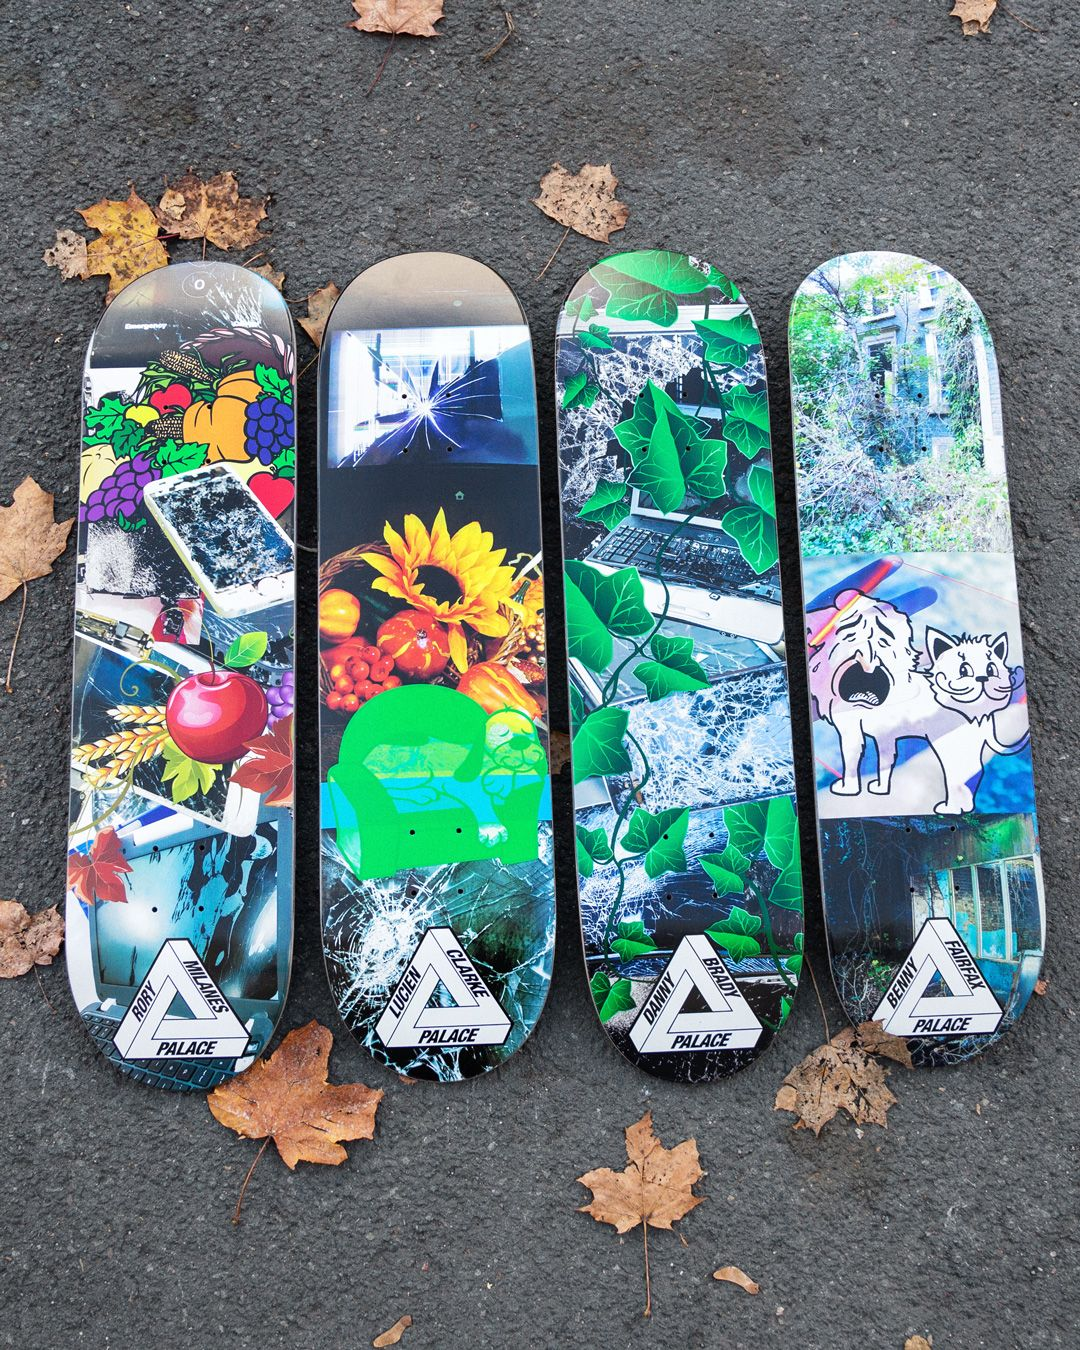 New Palace Skateboards Decks Skateboard Deck Skateboard